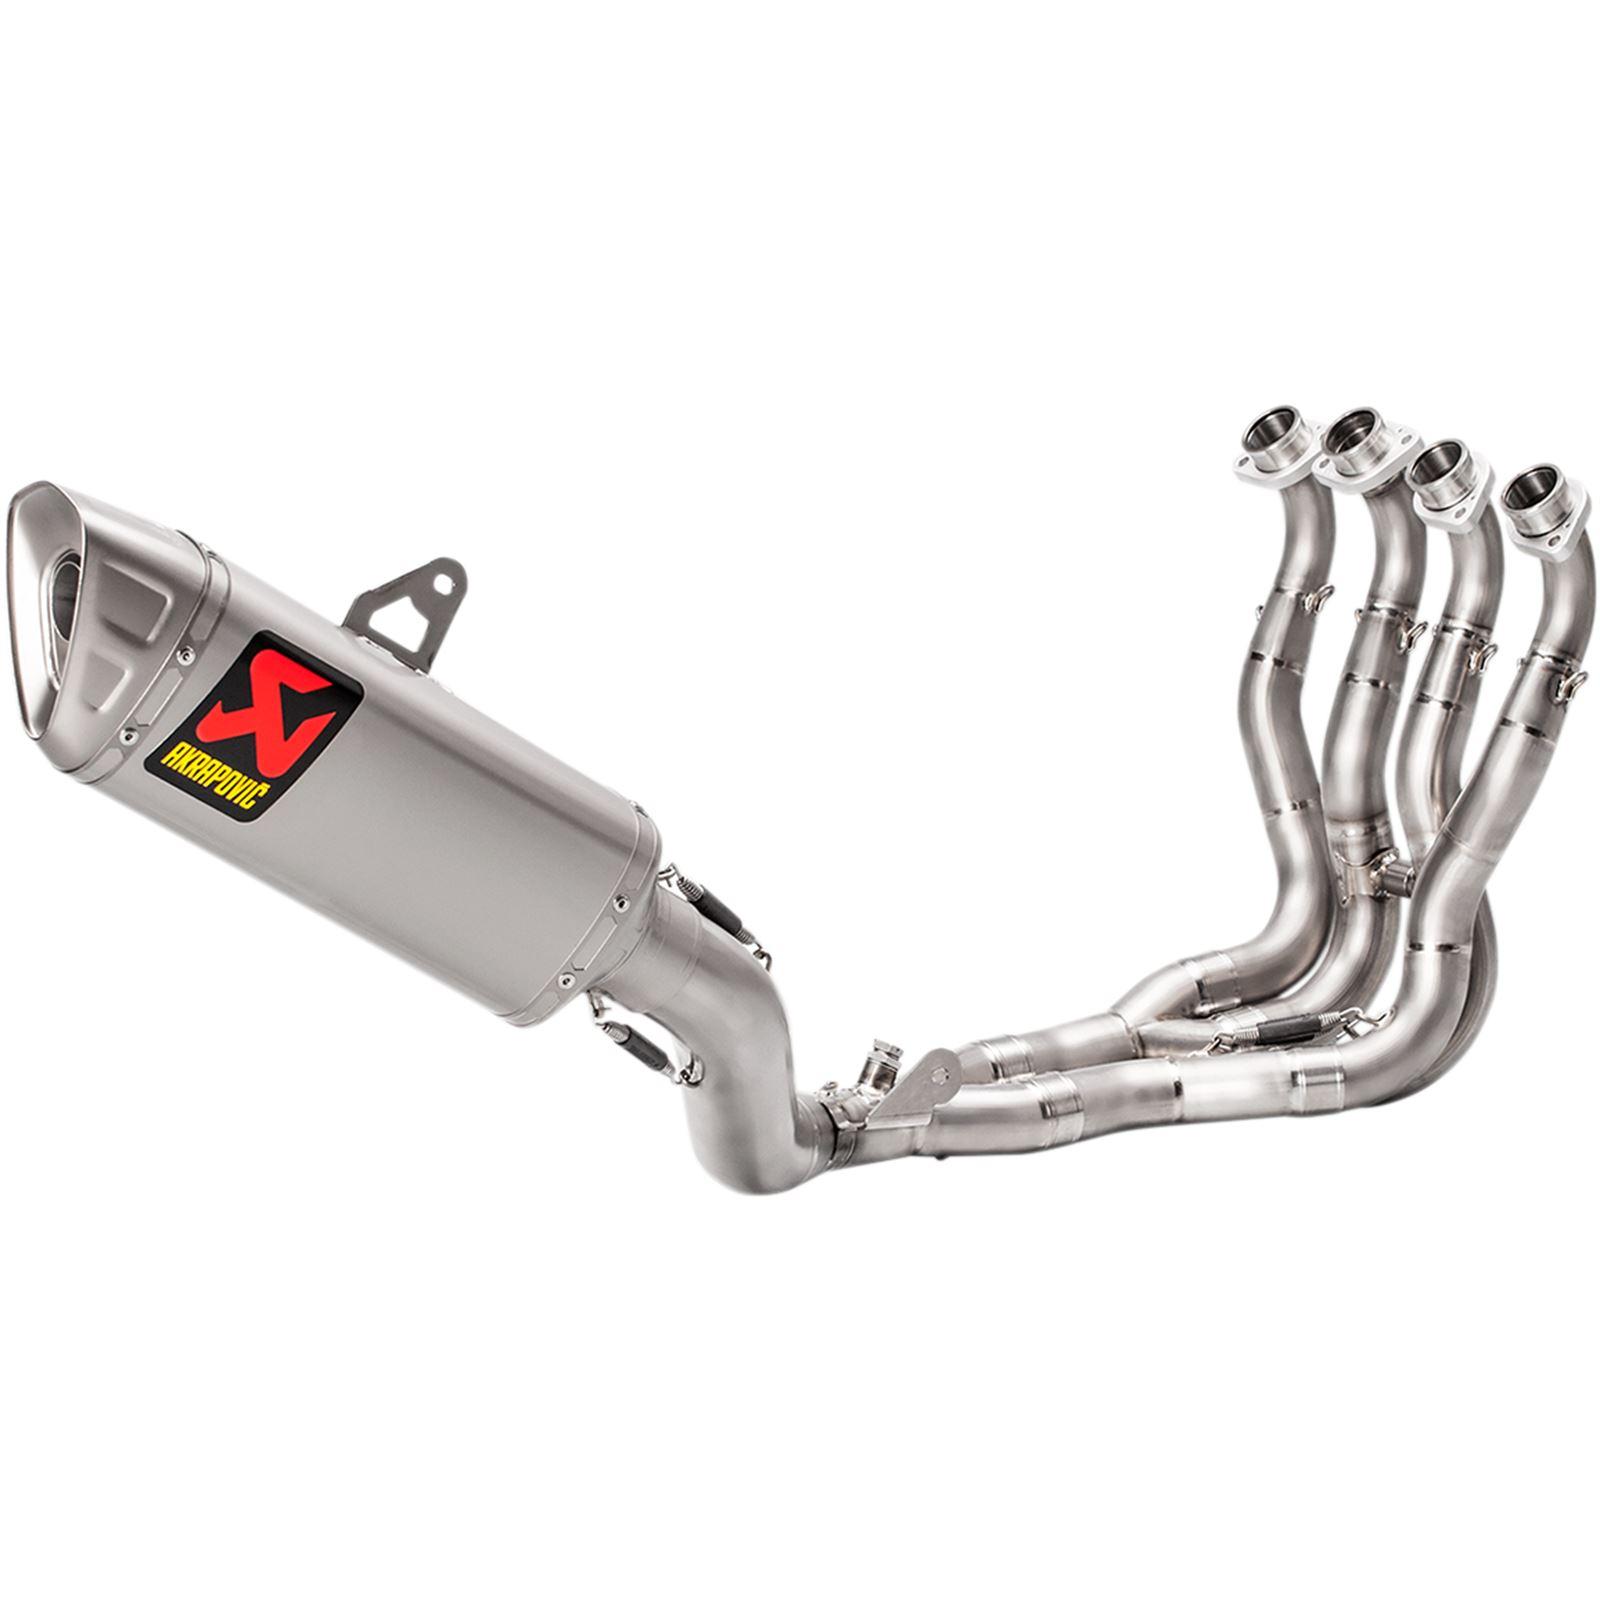 Akrapovic Evolution Exhaust - Titanium